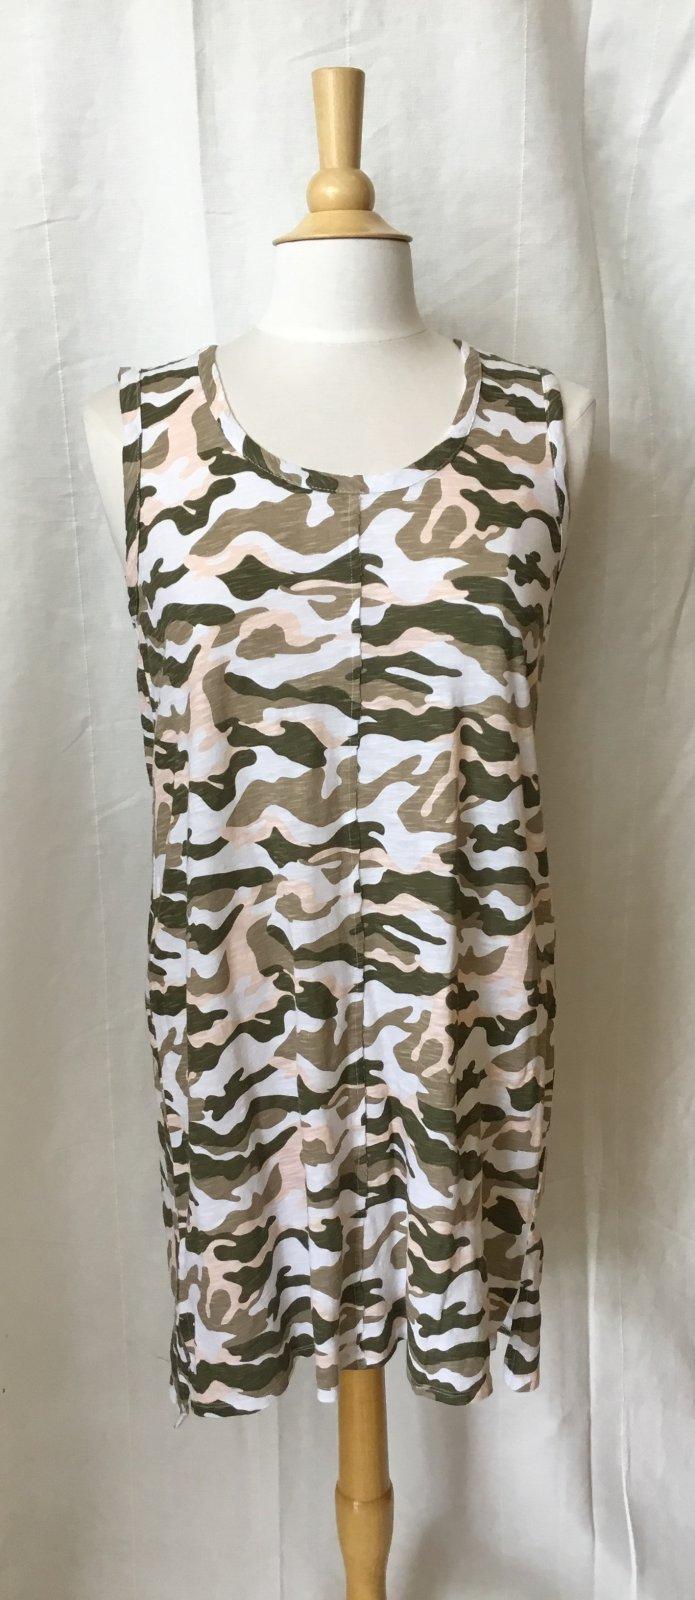 Bobi Tank Dress in Camo print